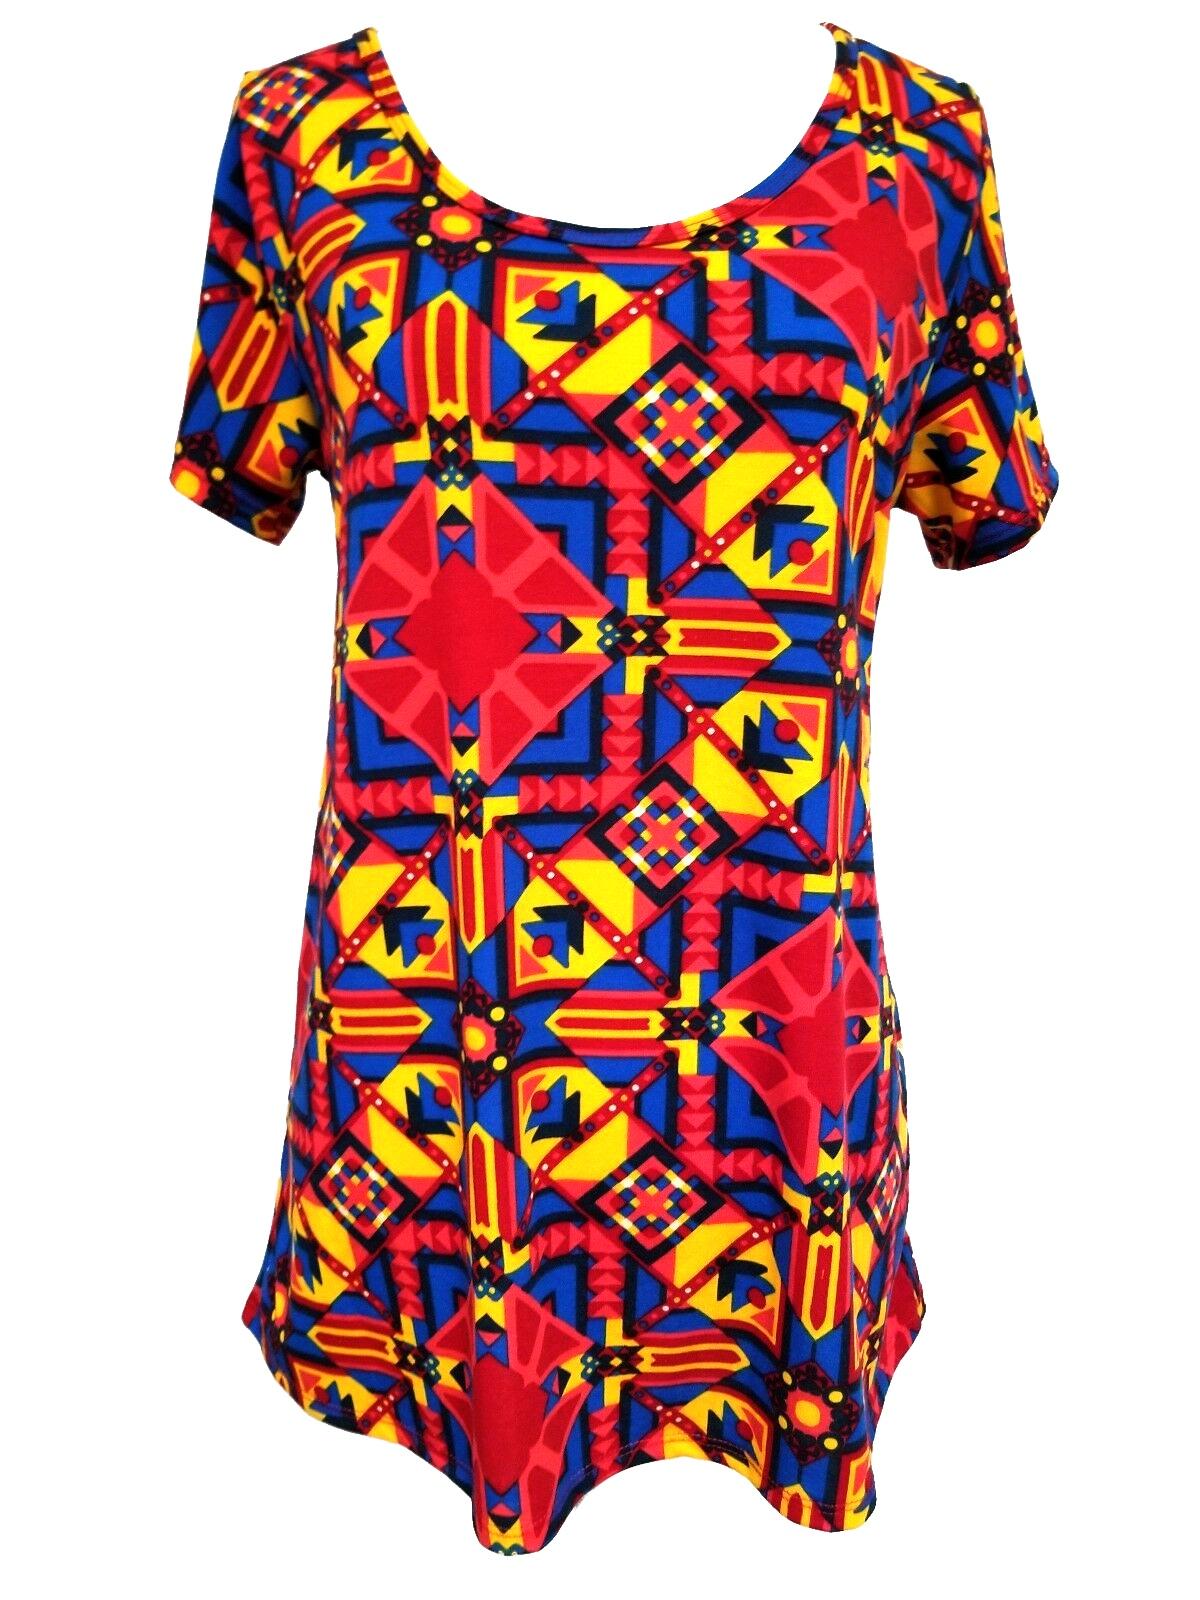 New LuLaRoe Classic tshirt Medium navy blue red yellow pink orange teal Aztec